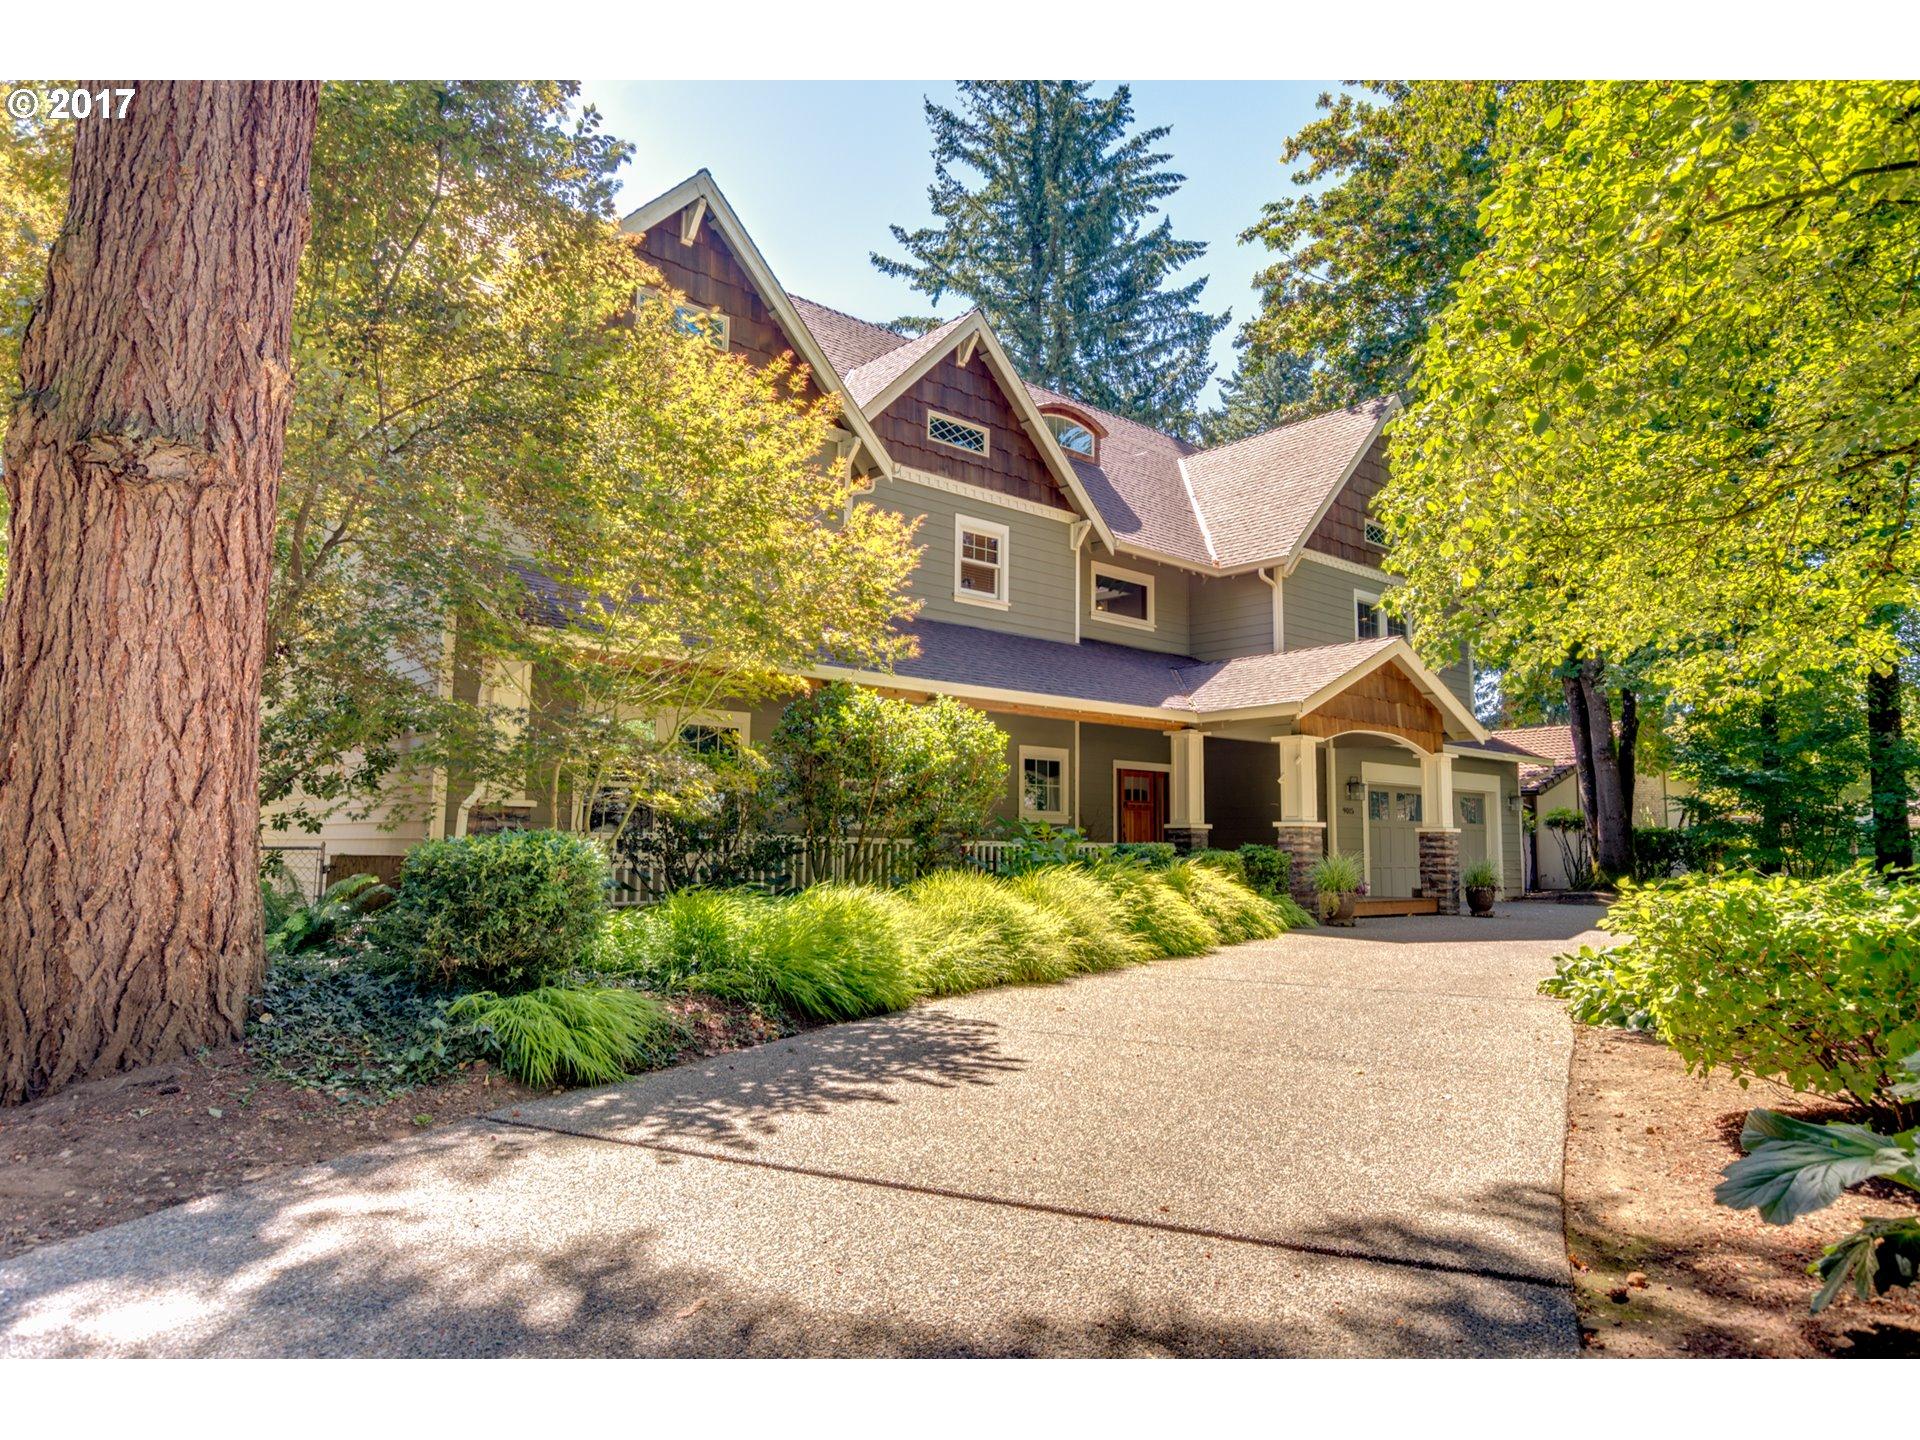 9015 MT LASSEN AVE, Vancouver, WA 98664